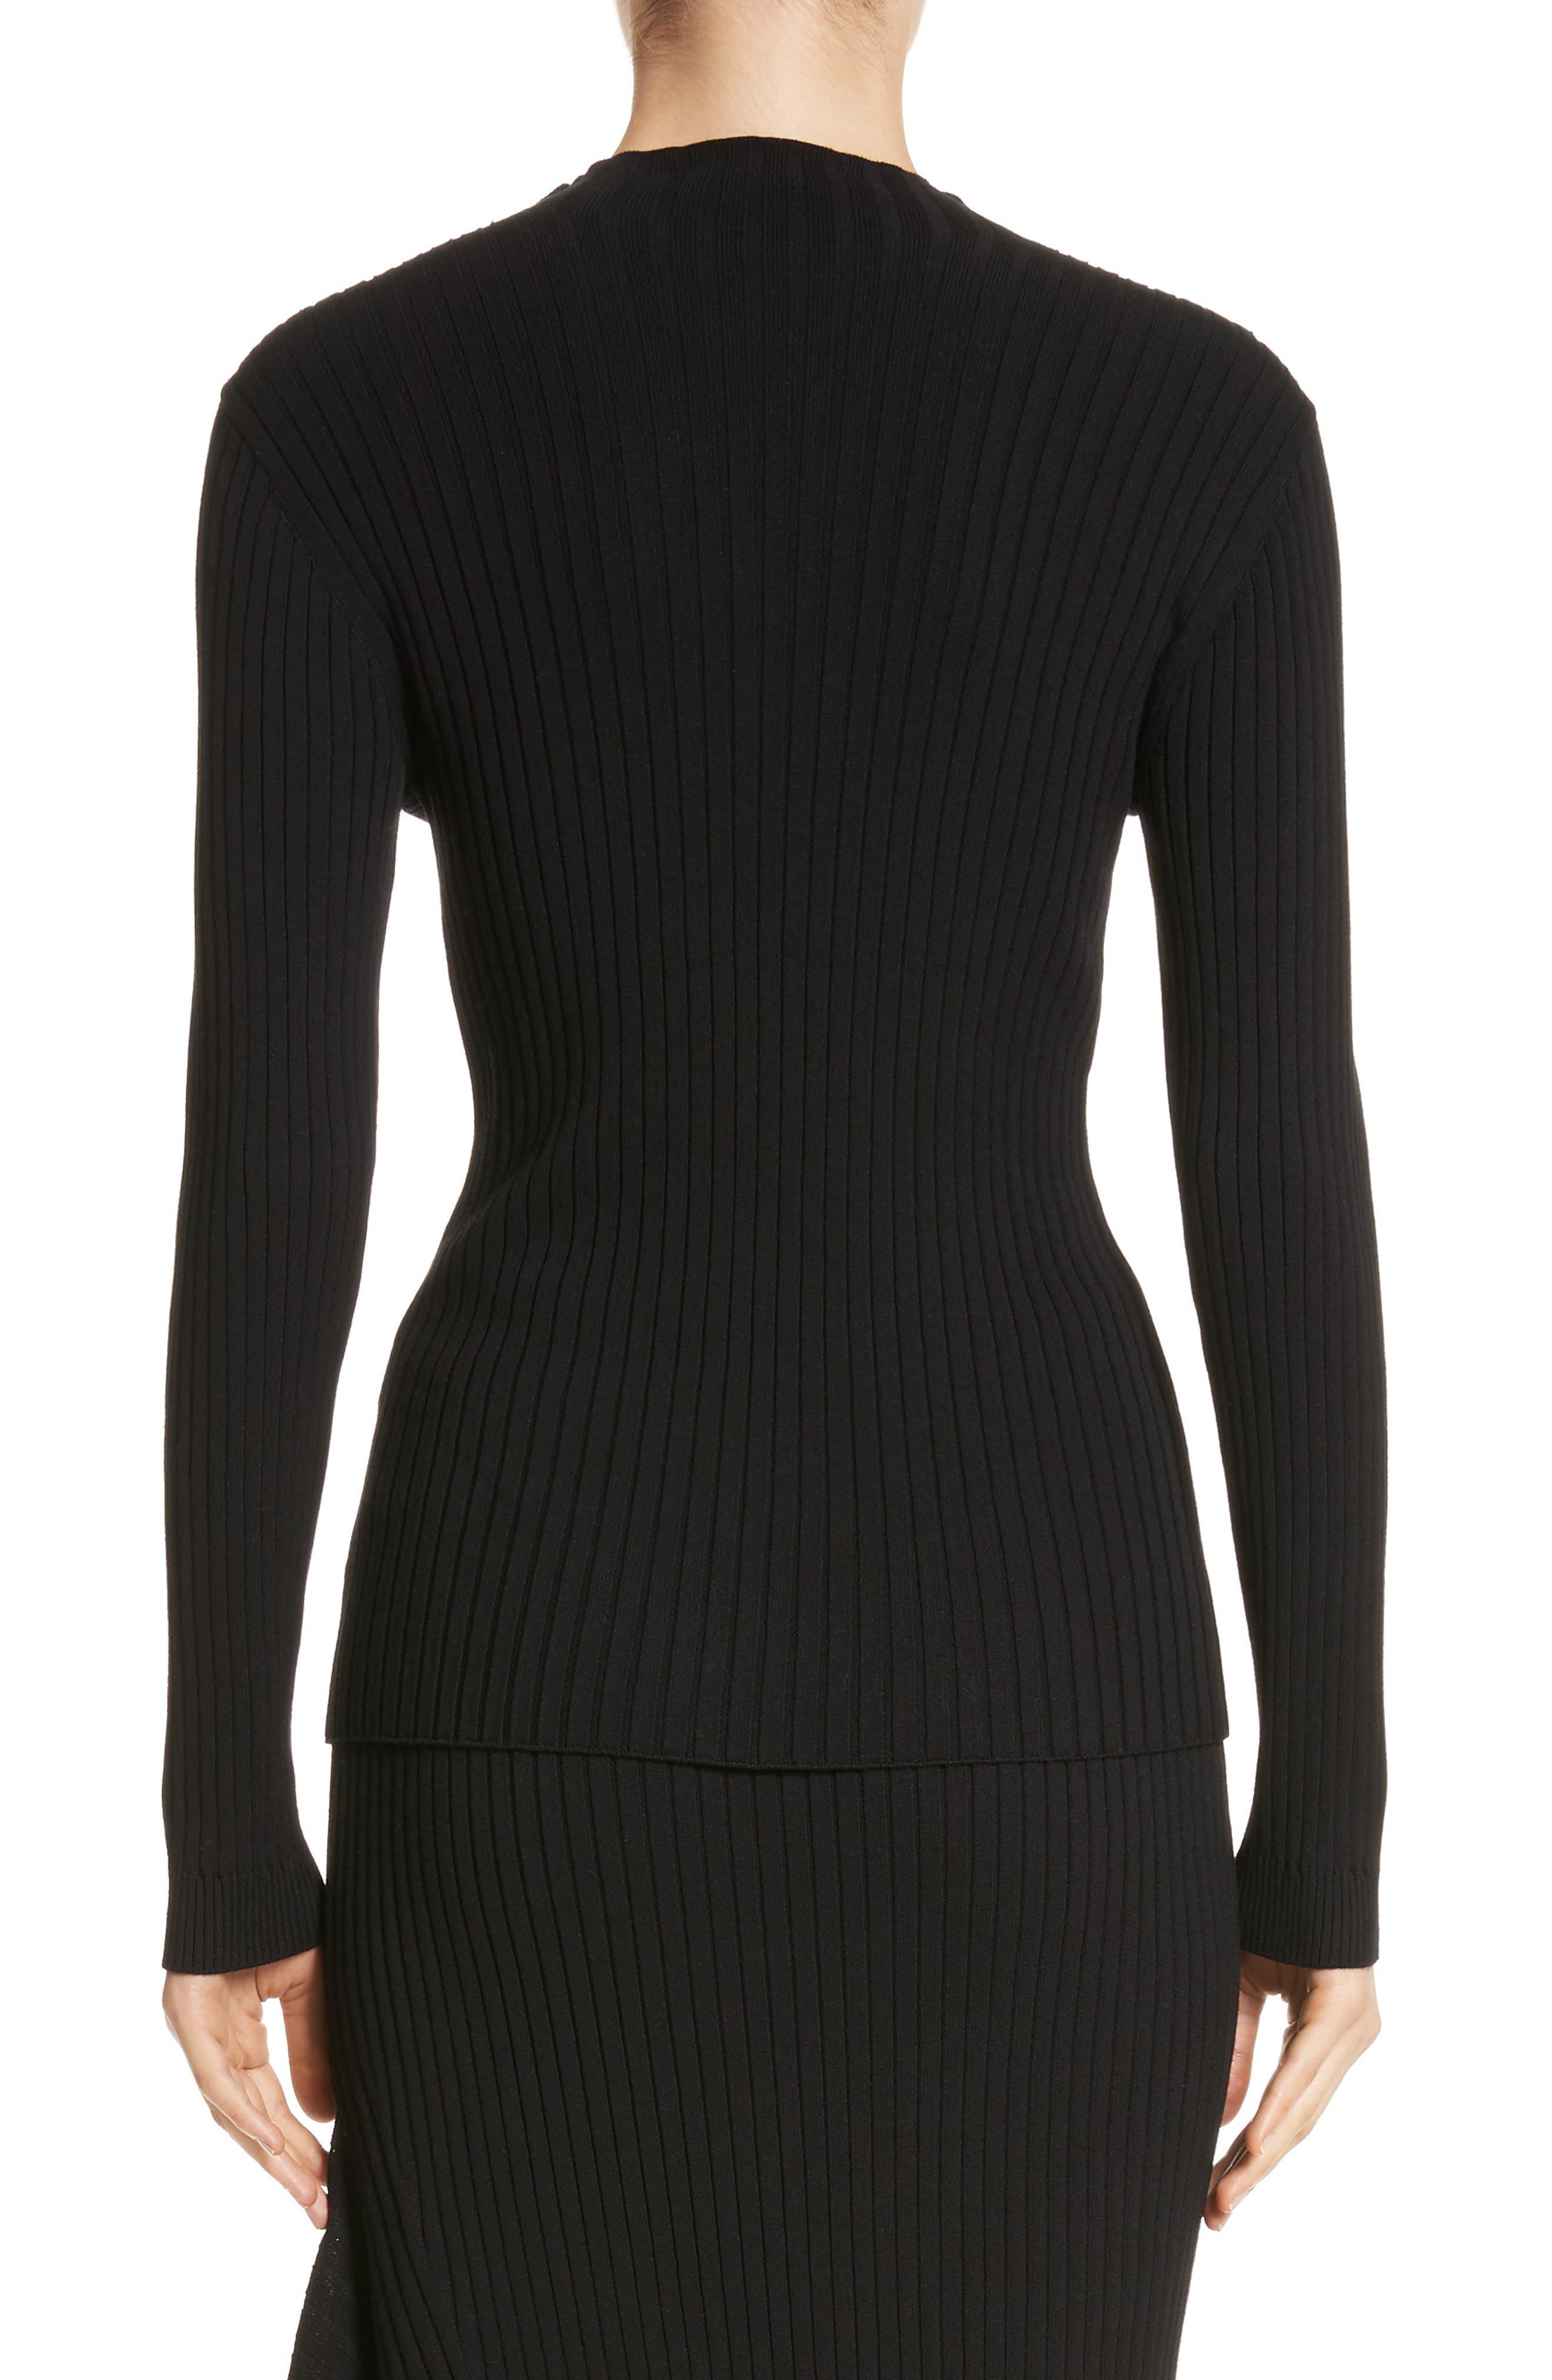 Flat Rib Knit Mock Neck Sweater,                             Alternate thumbnail 2, color,                             Caviar